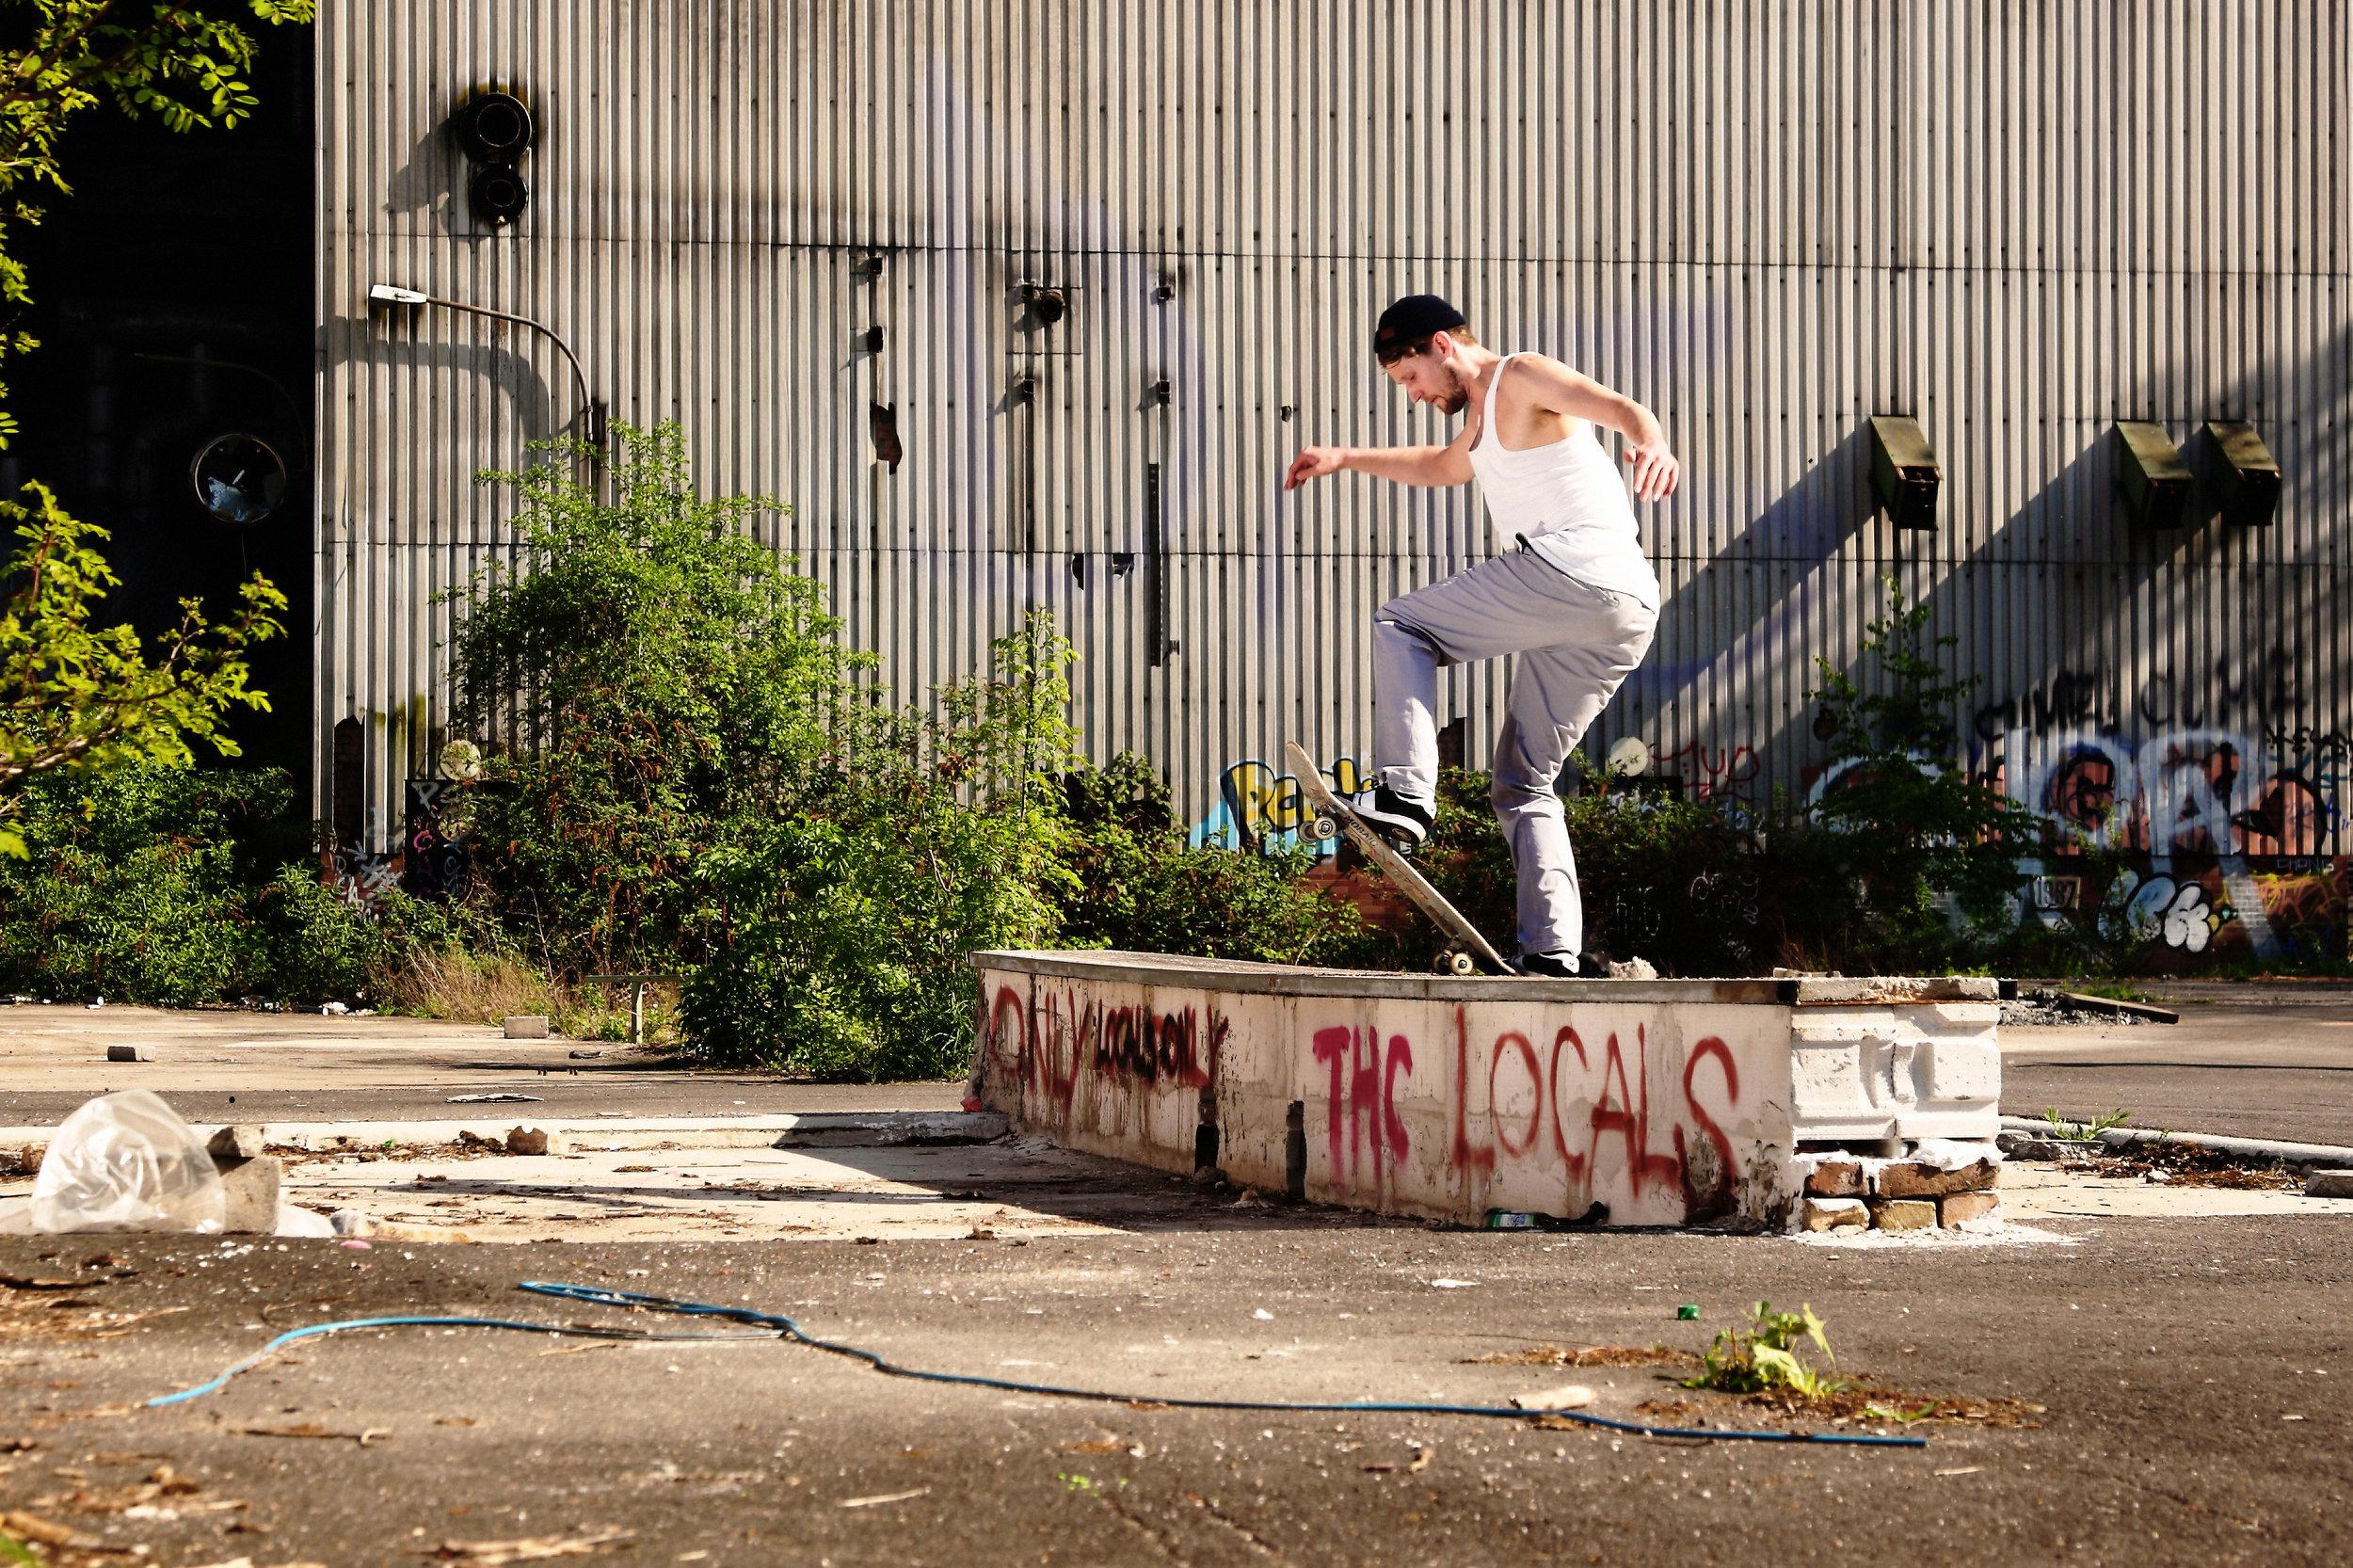 Marc stevens - Photo: Leon Schmidt